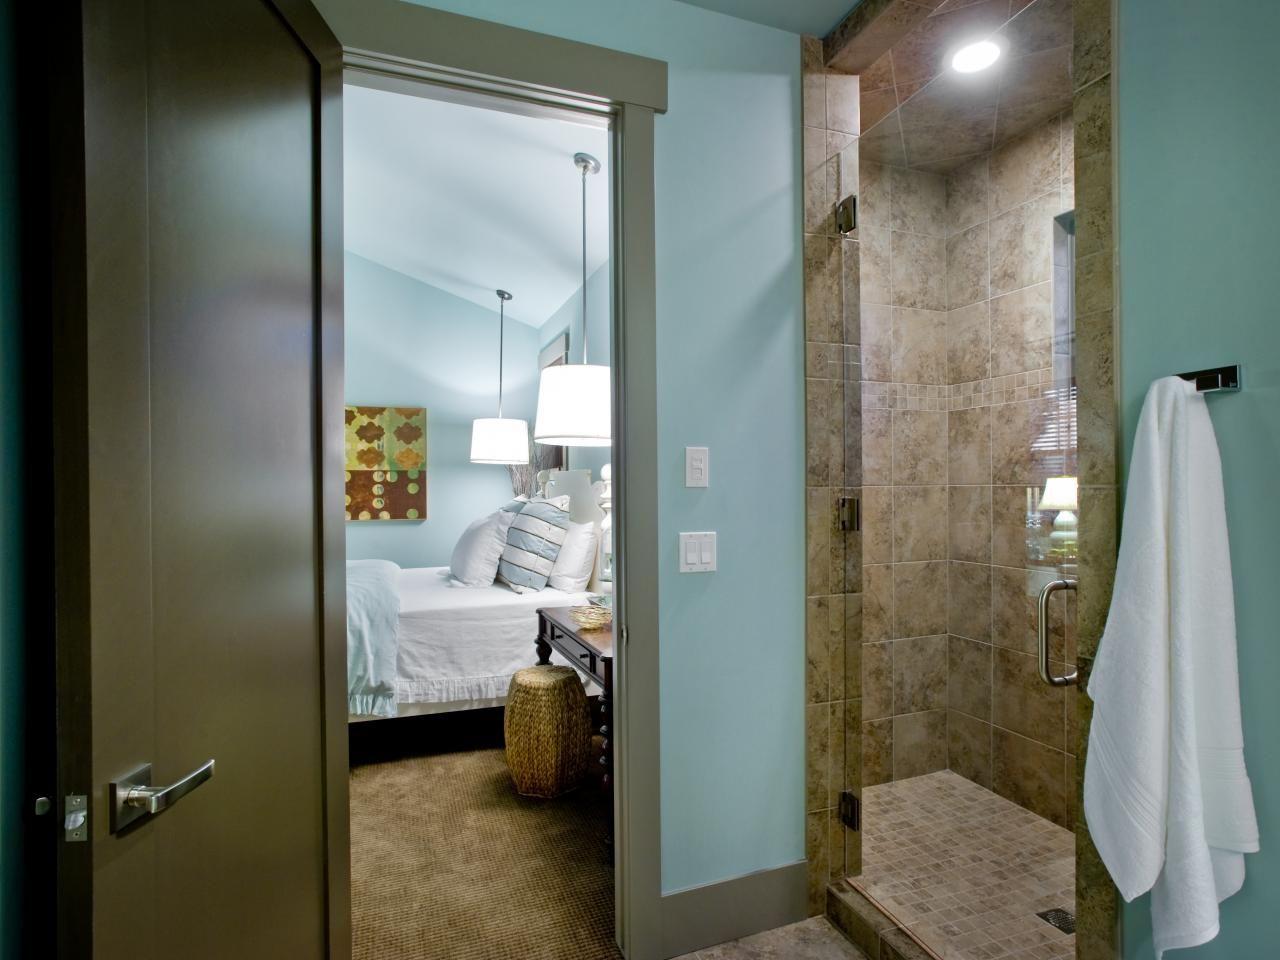 Guest Bathroom From HGTV Dream Home 2012 | Porcelain tile, Hgtv and ...